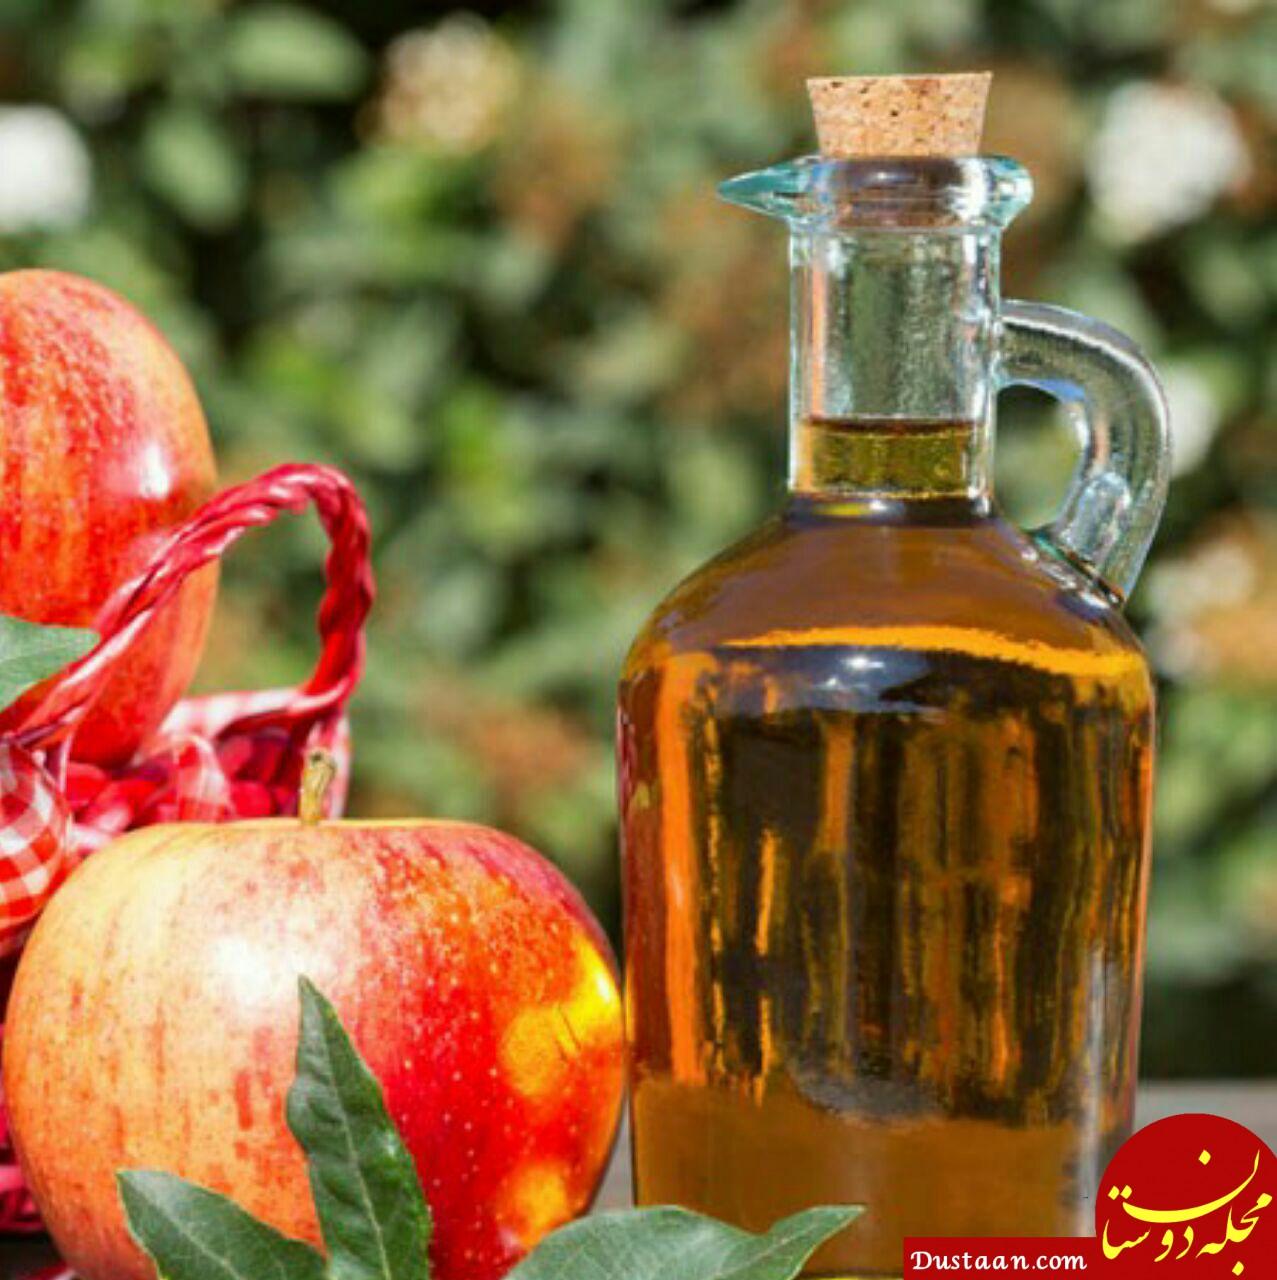 www.dustaan.com درمان عفونت قارچی زنان باسرکه سیب